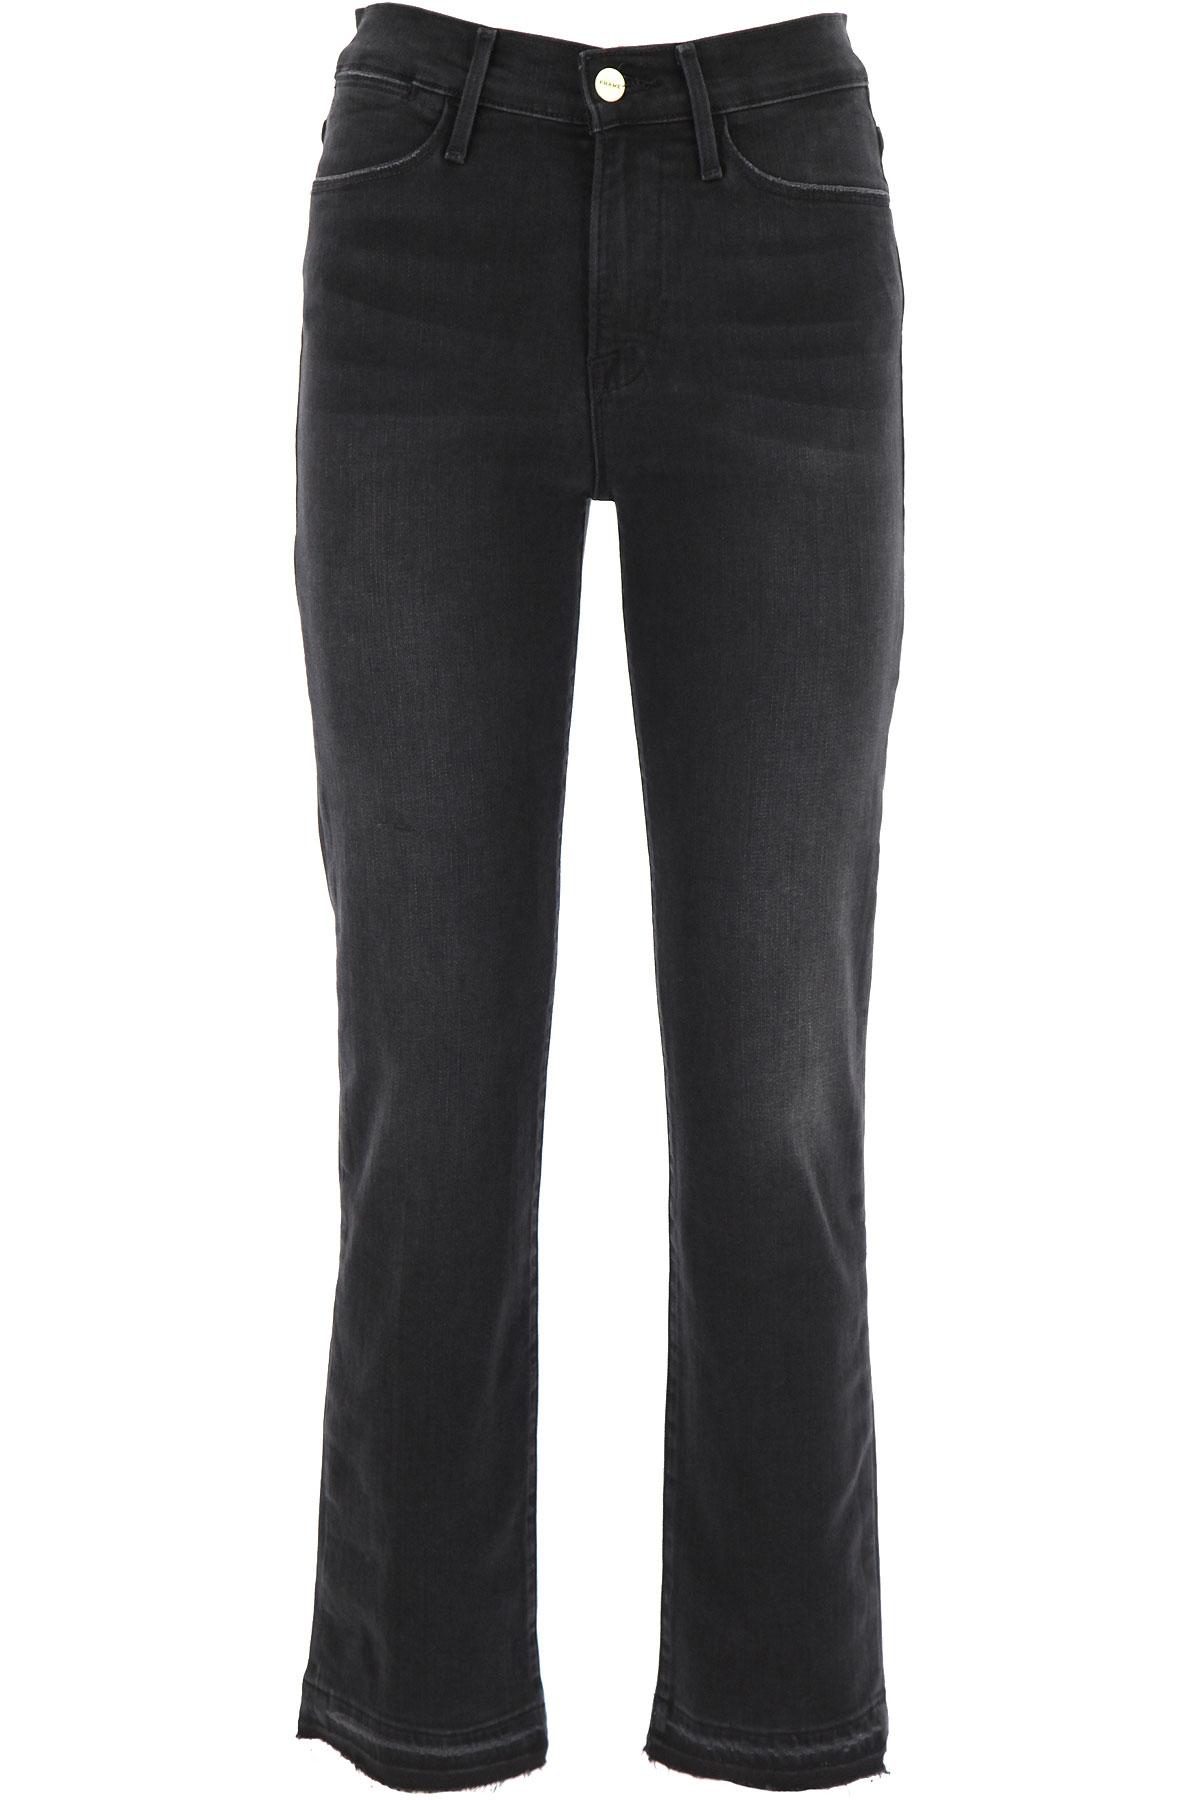 Frame Jeans On Sale, Black, Cotton, 2019, US 25 -- EU 39 US 27 - UK 8/10 - IT 42 US 28 - UK 10 - IT 44 US 29 - UK 12 - IT 46